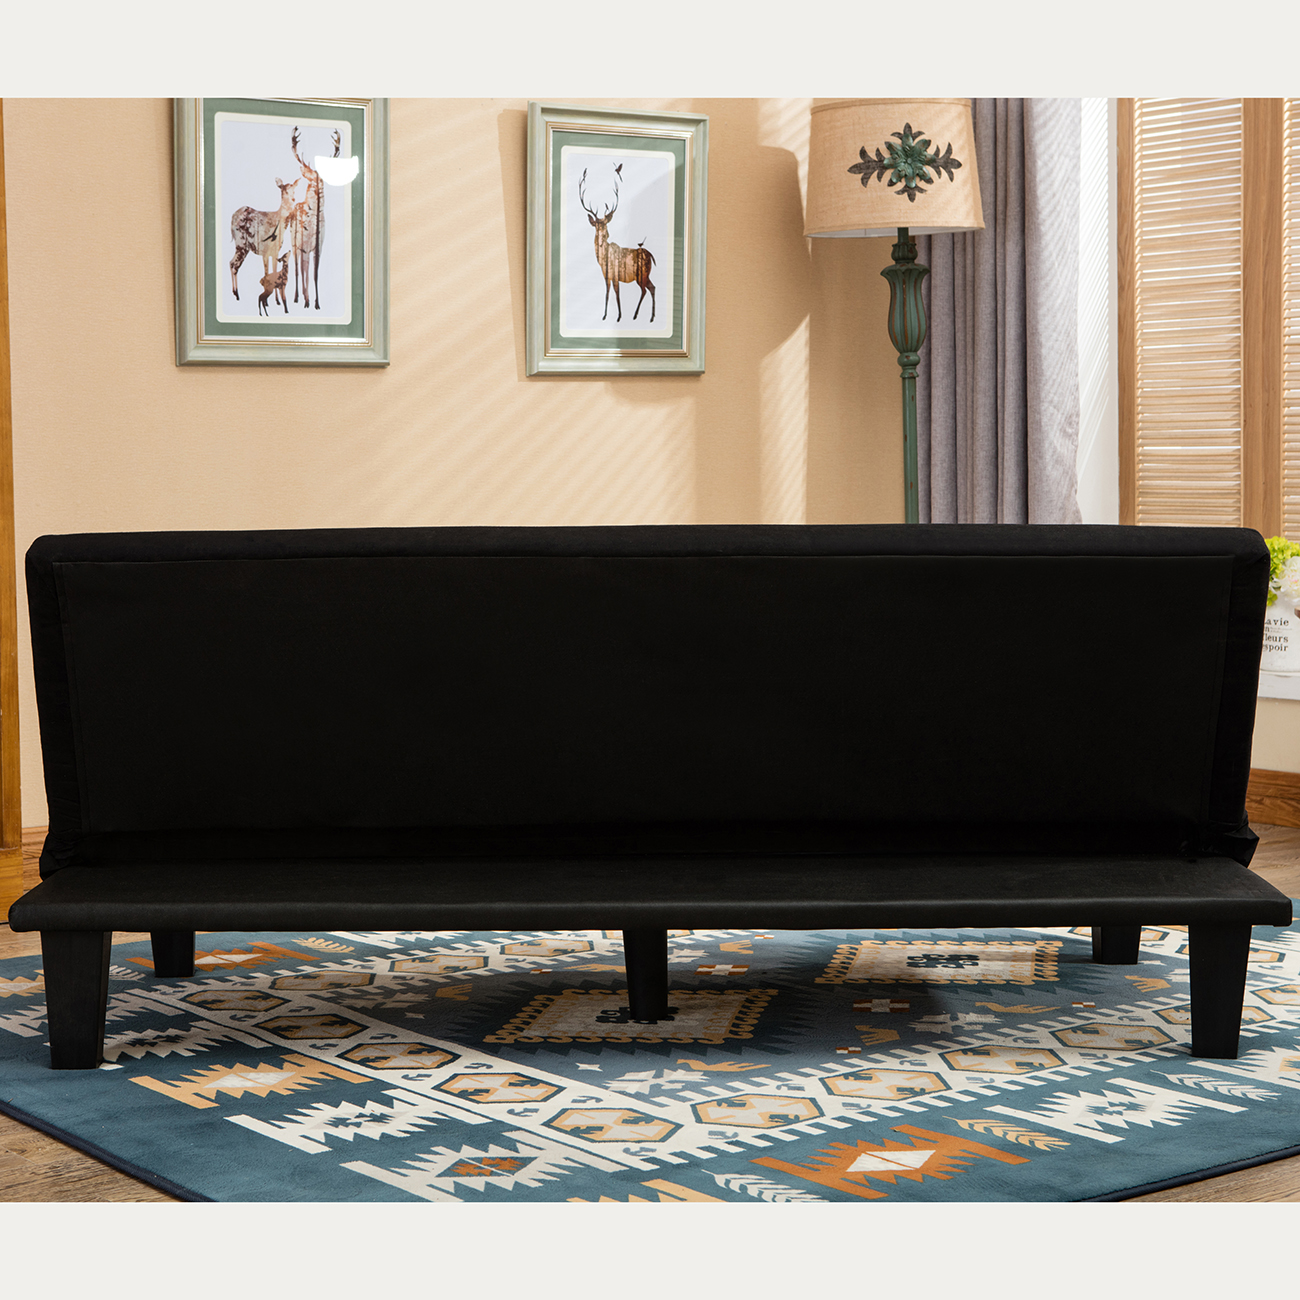 sofa bed modern style ikea white futon couch sleeper lounge sleep